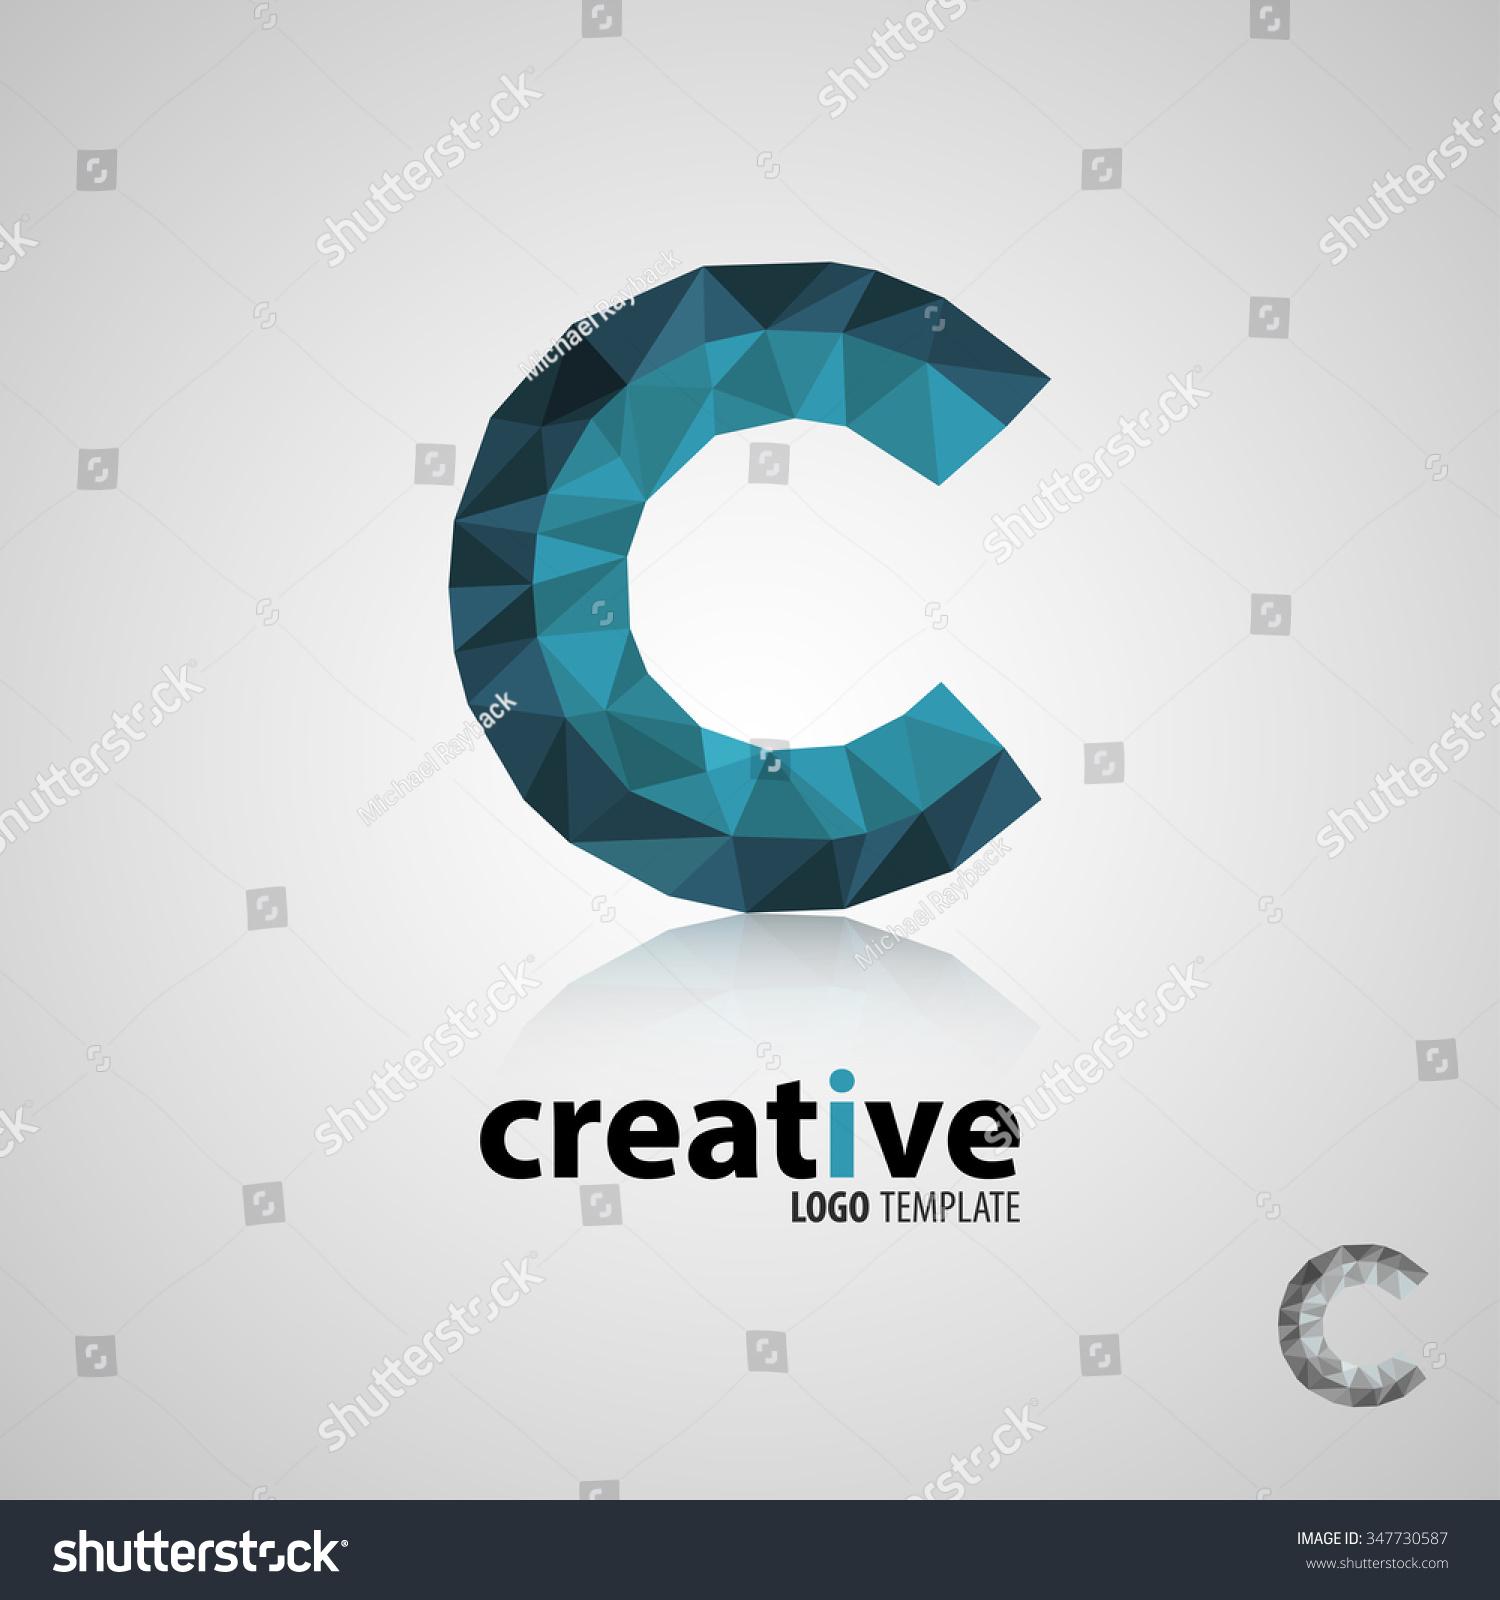 creative logo design letter c logo stock vector 347730587